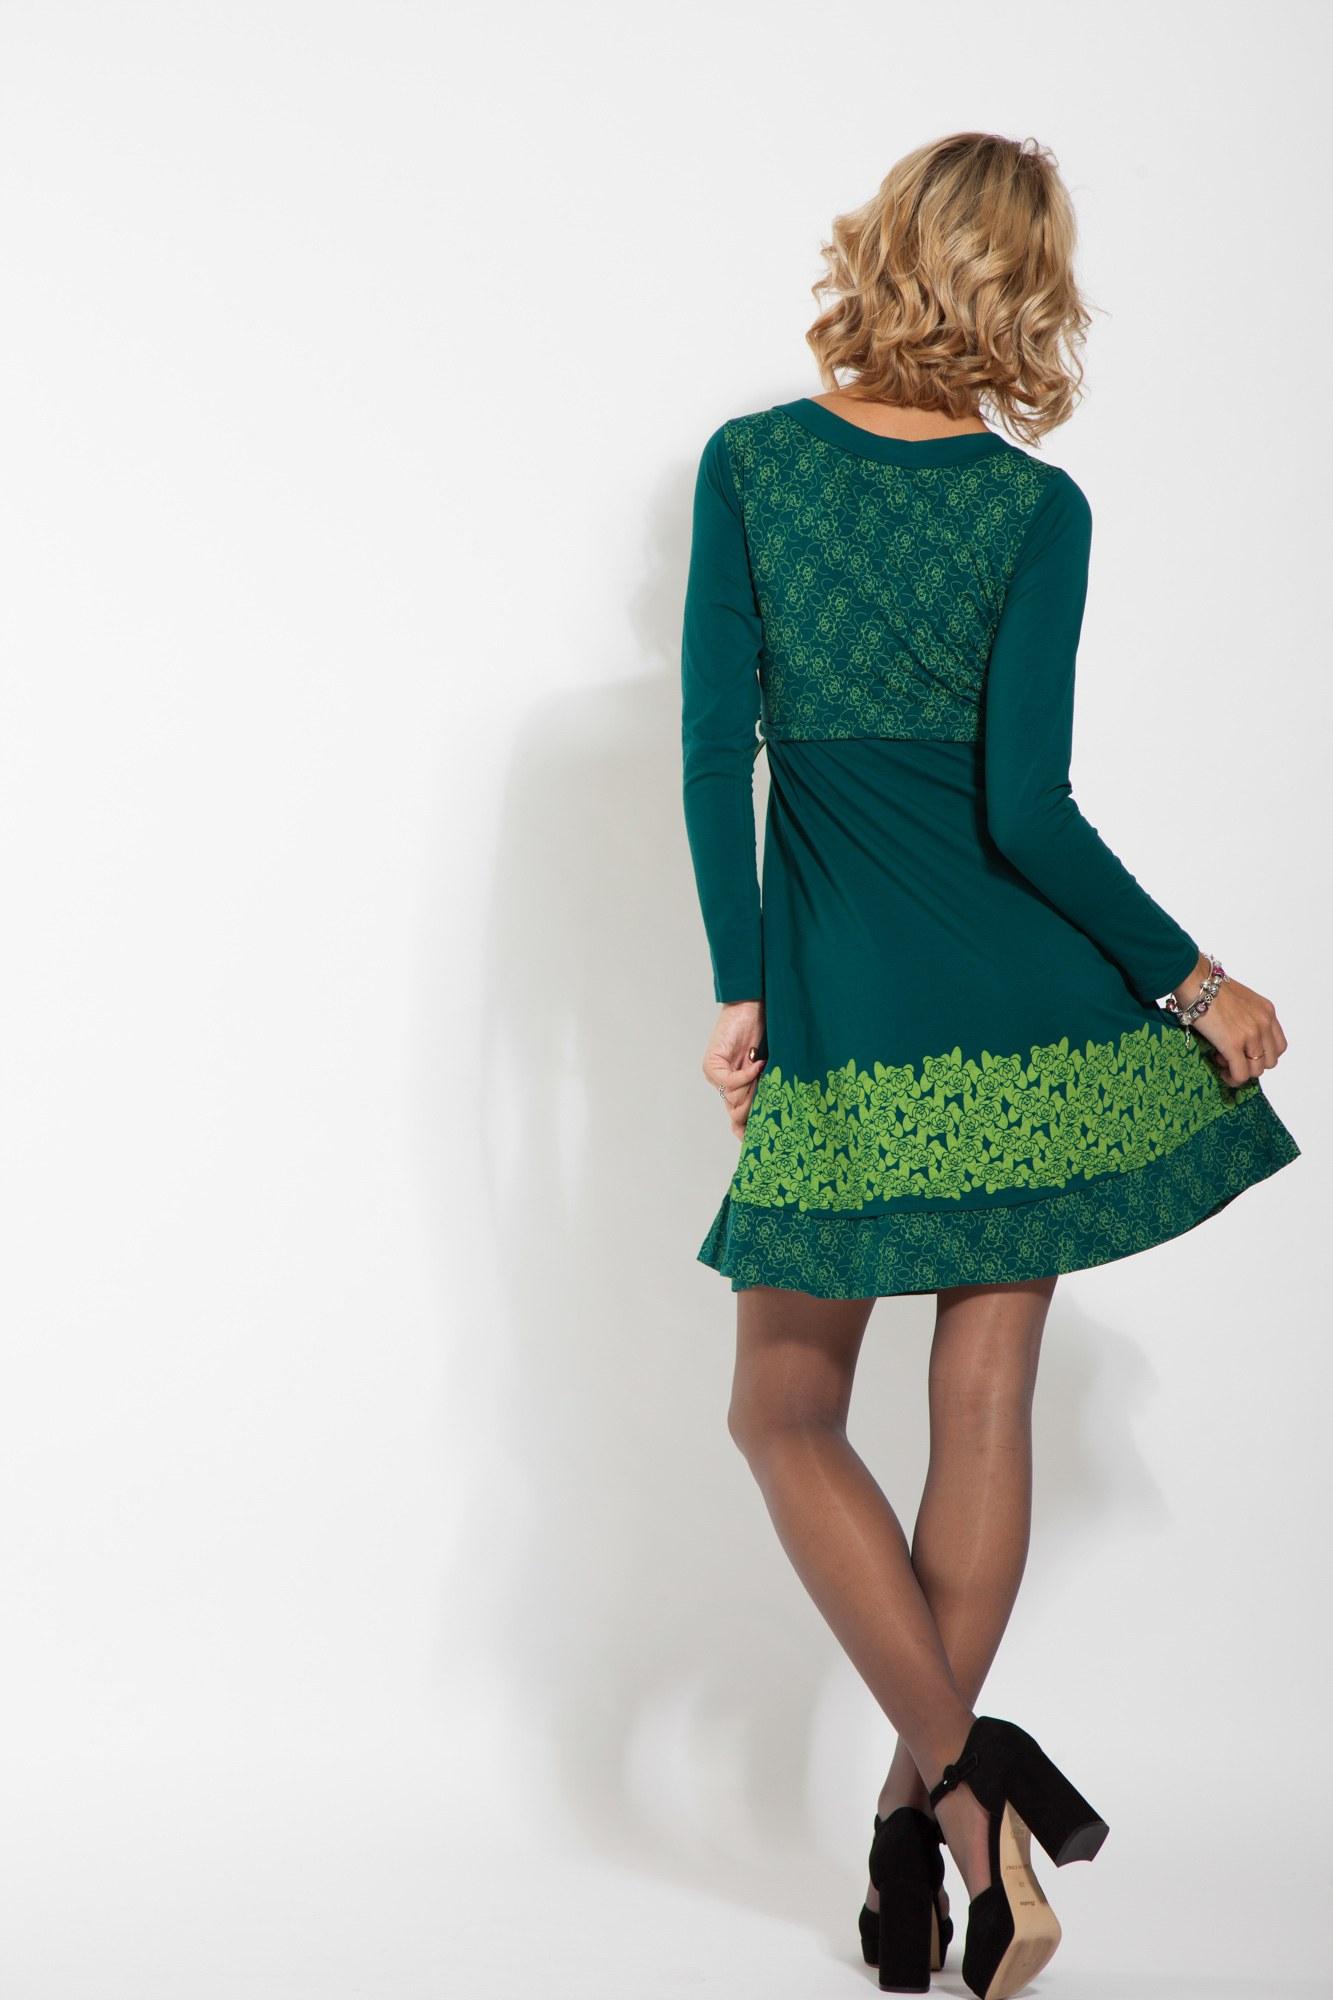 Rochie verde bumbac Infinity imprimata